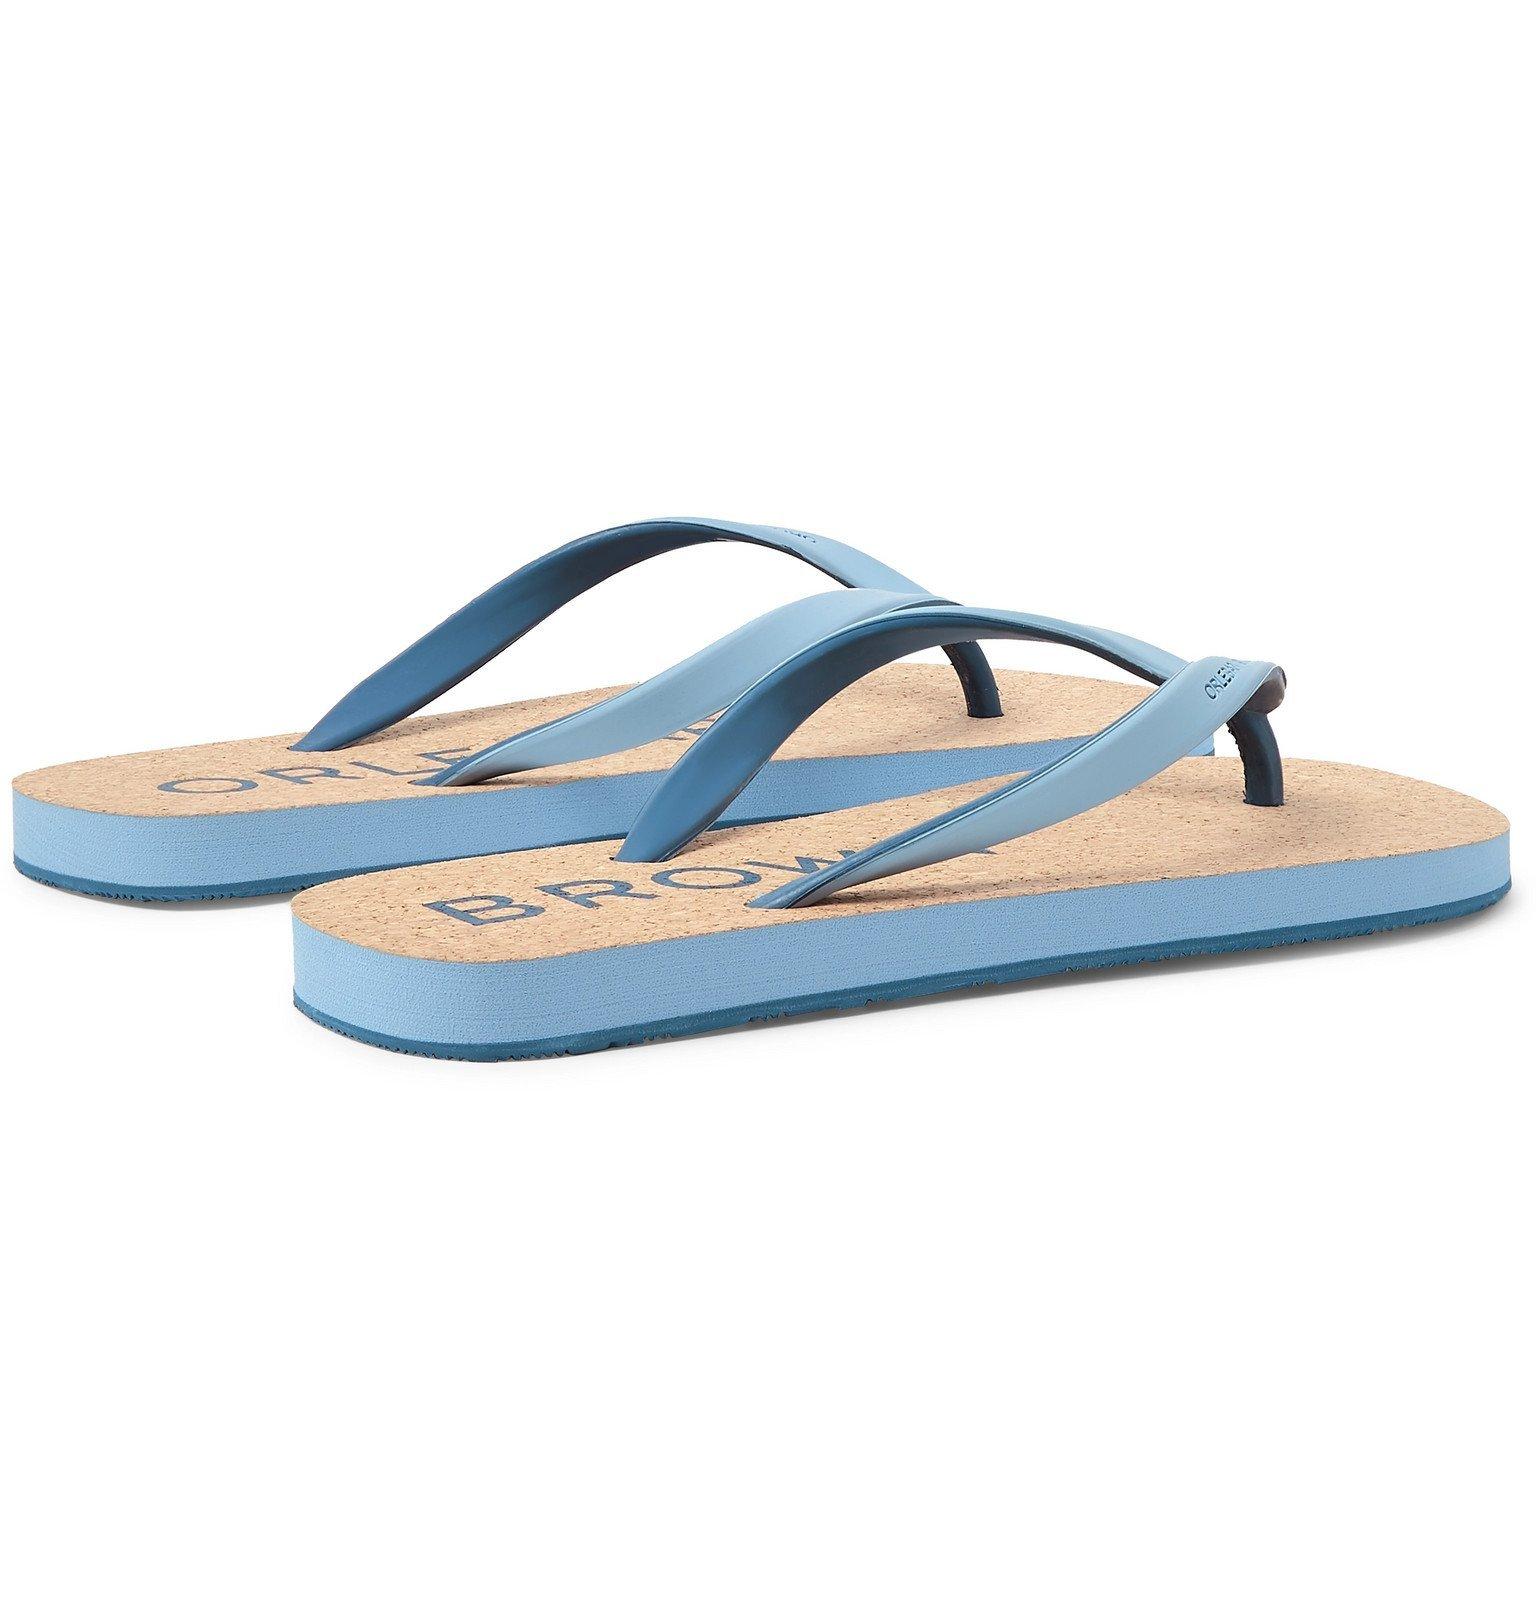 Orlebar Brown - Haston Rubber and Cork Flip Flops - Blue